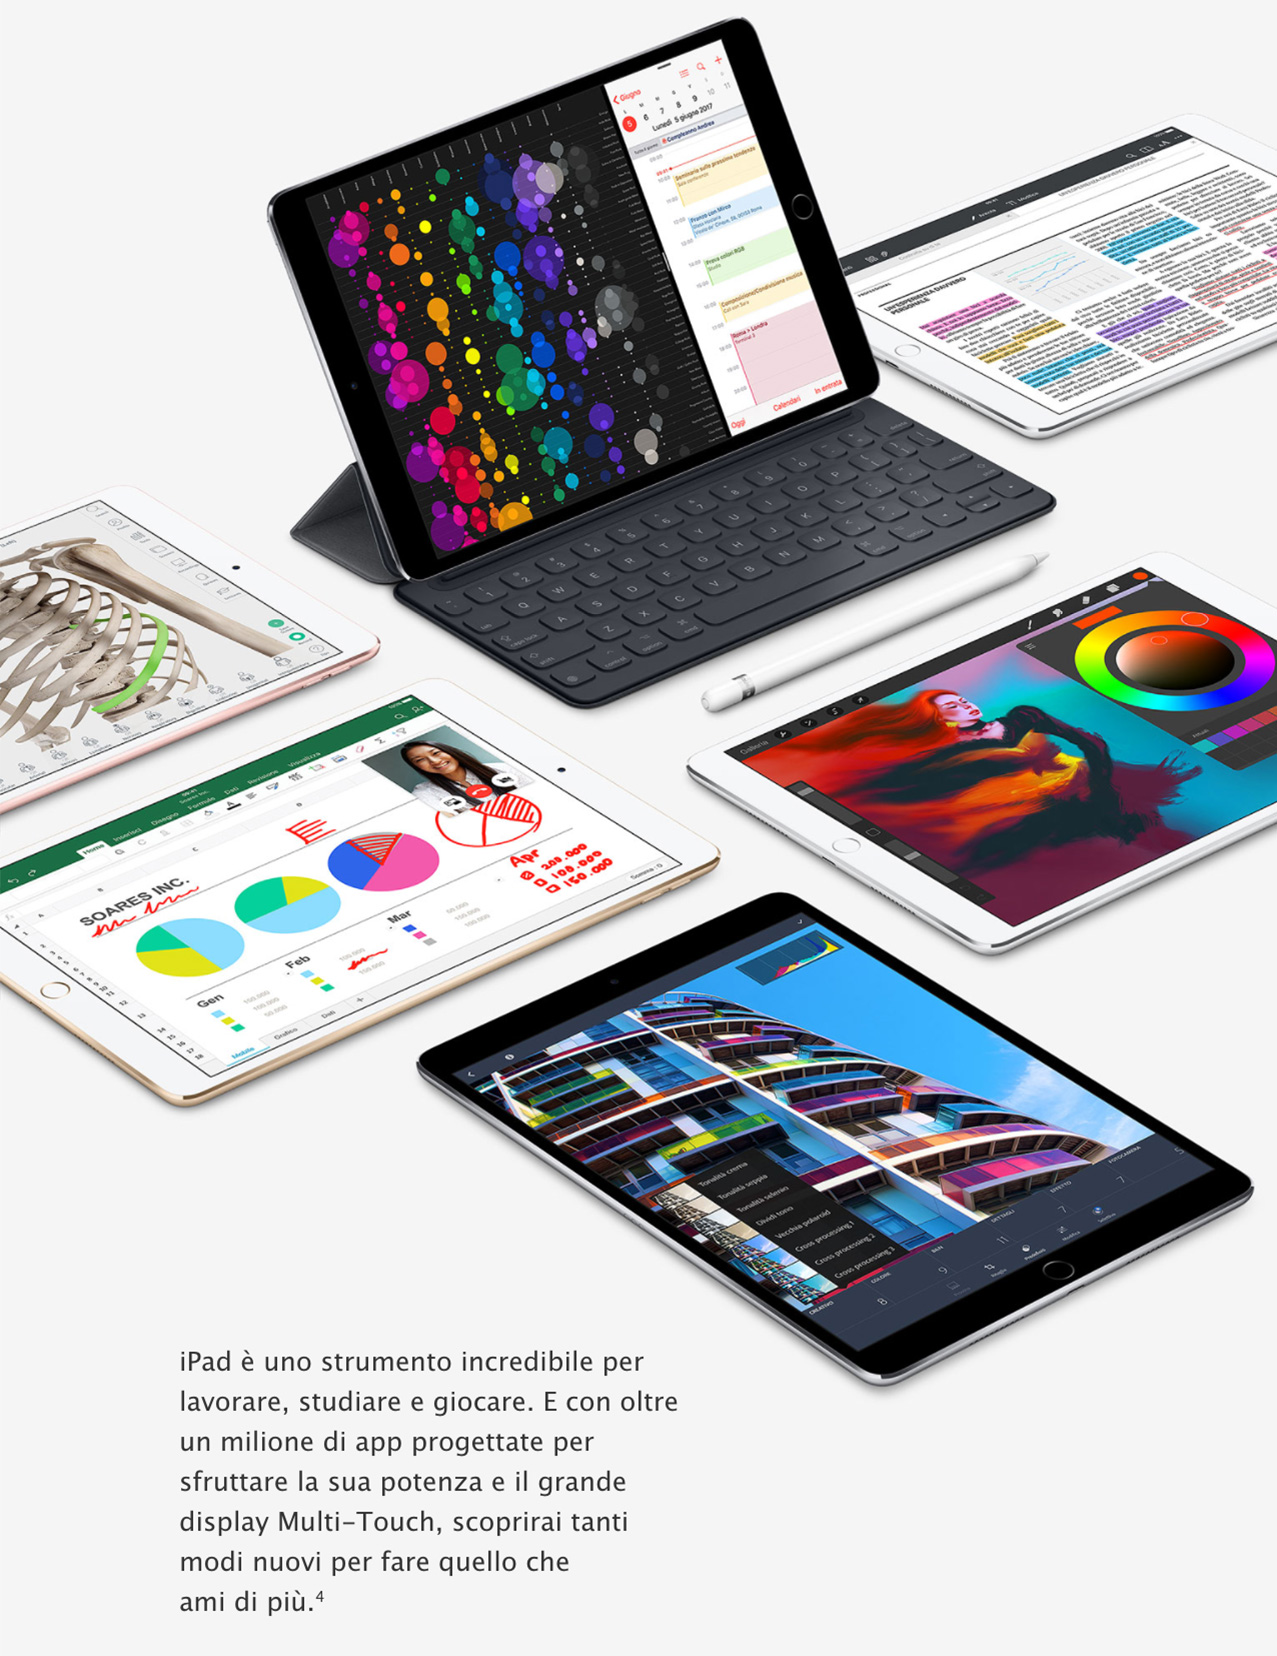 iPad Pro strumento lavoro